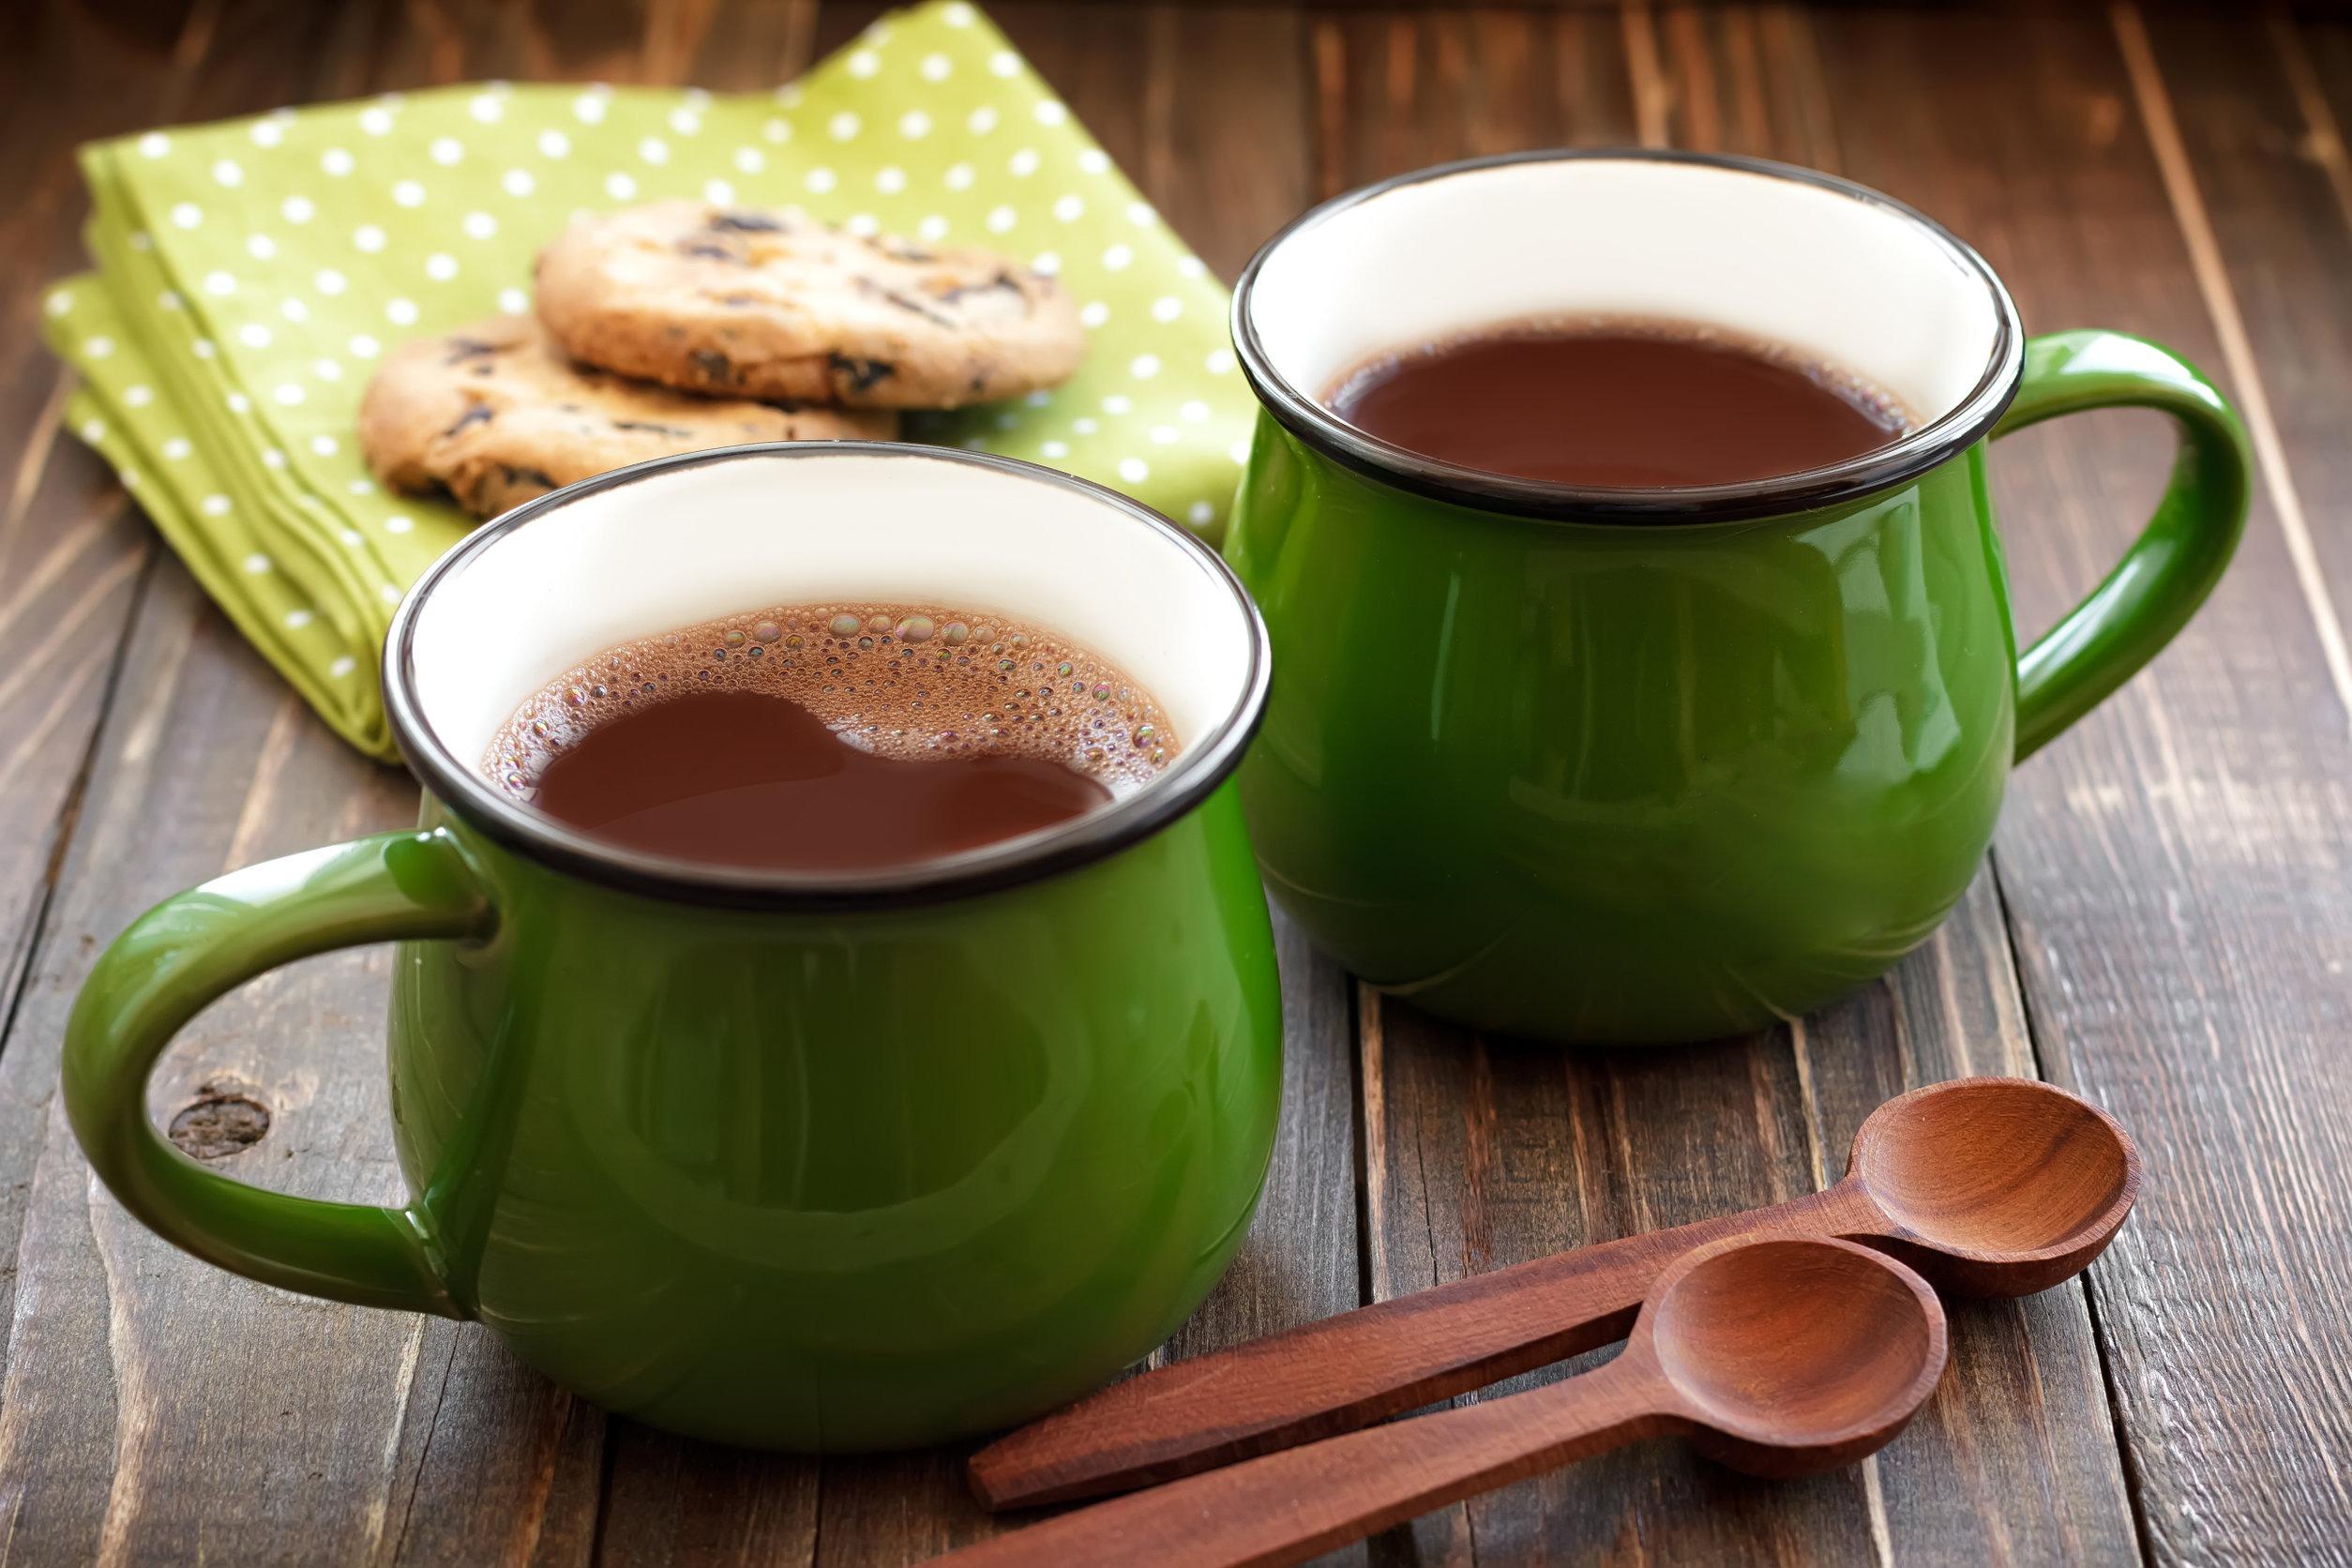 Spicy Maple Hot Cocoa